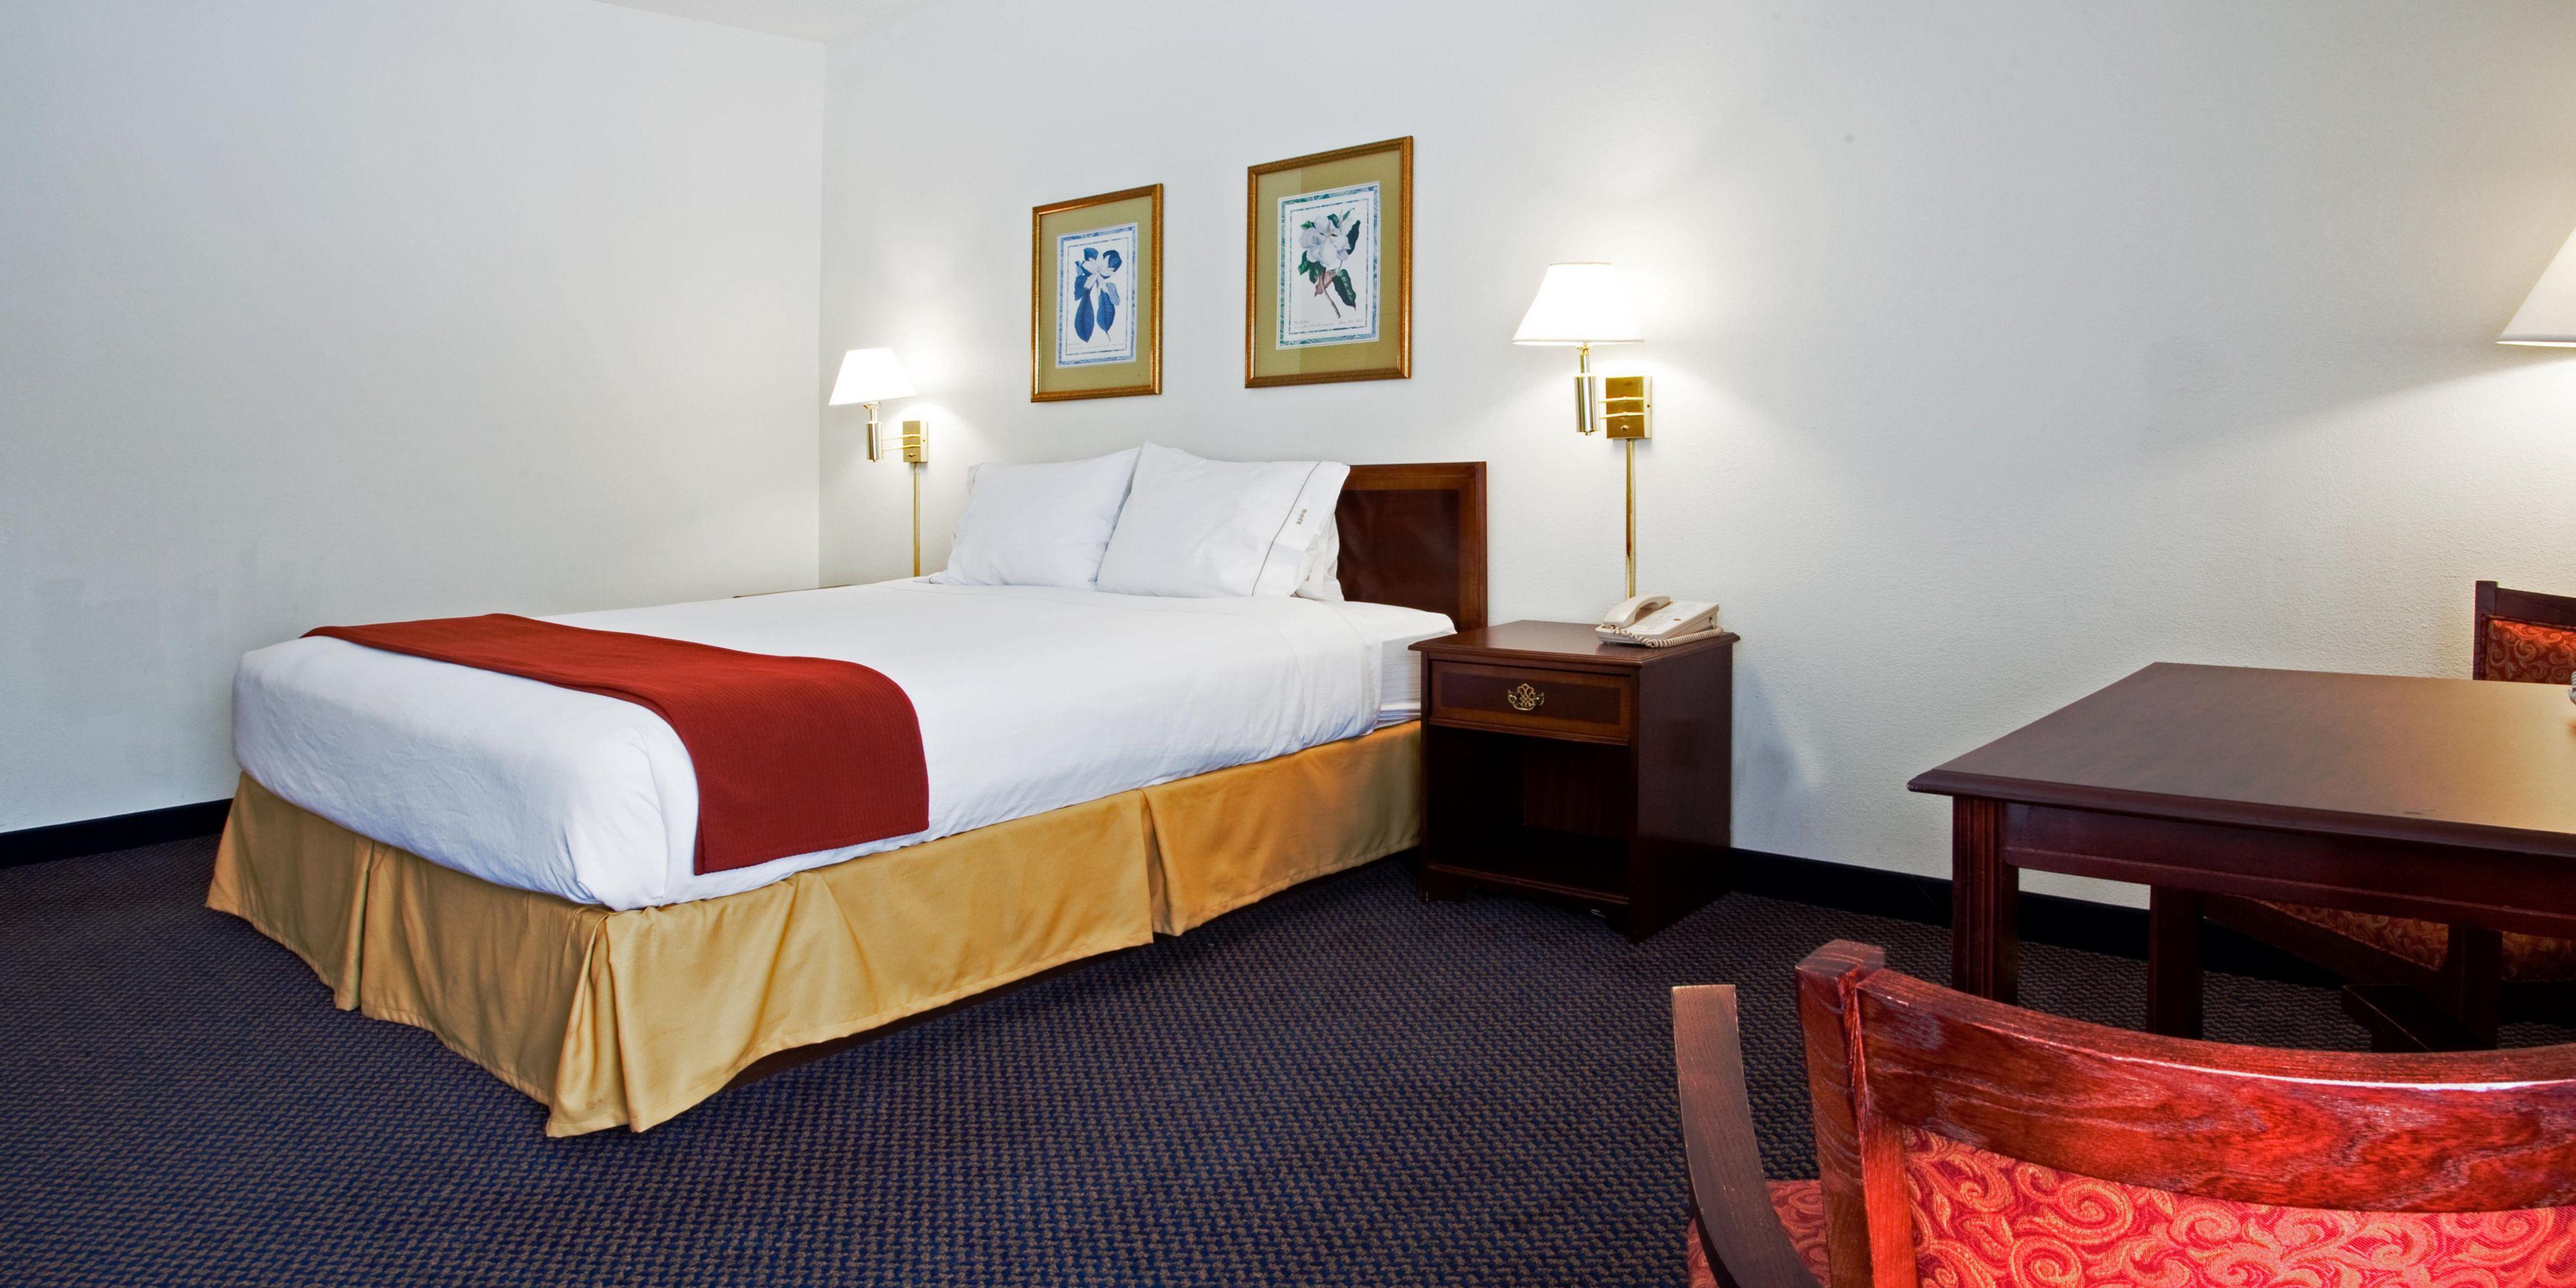 Holiday Inn Express Hillsborough 2532451398 2x1